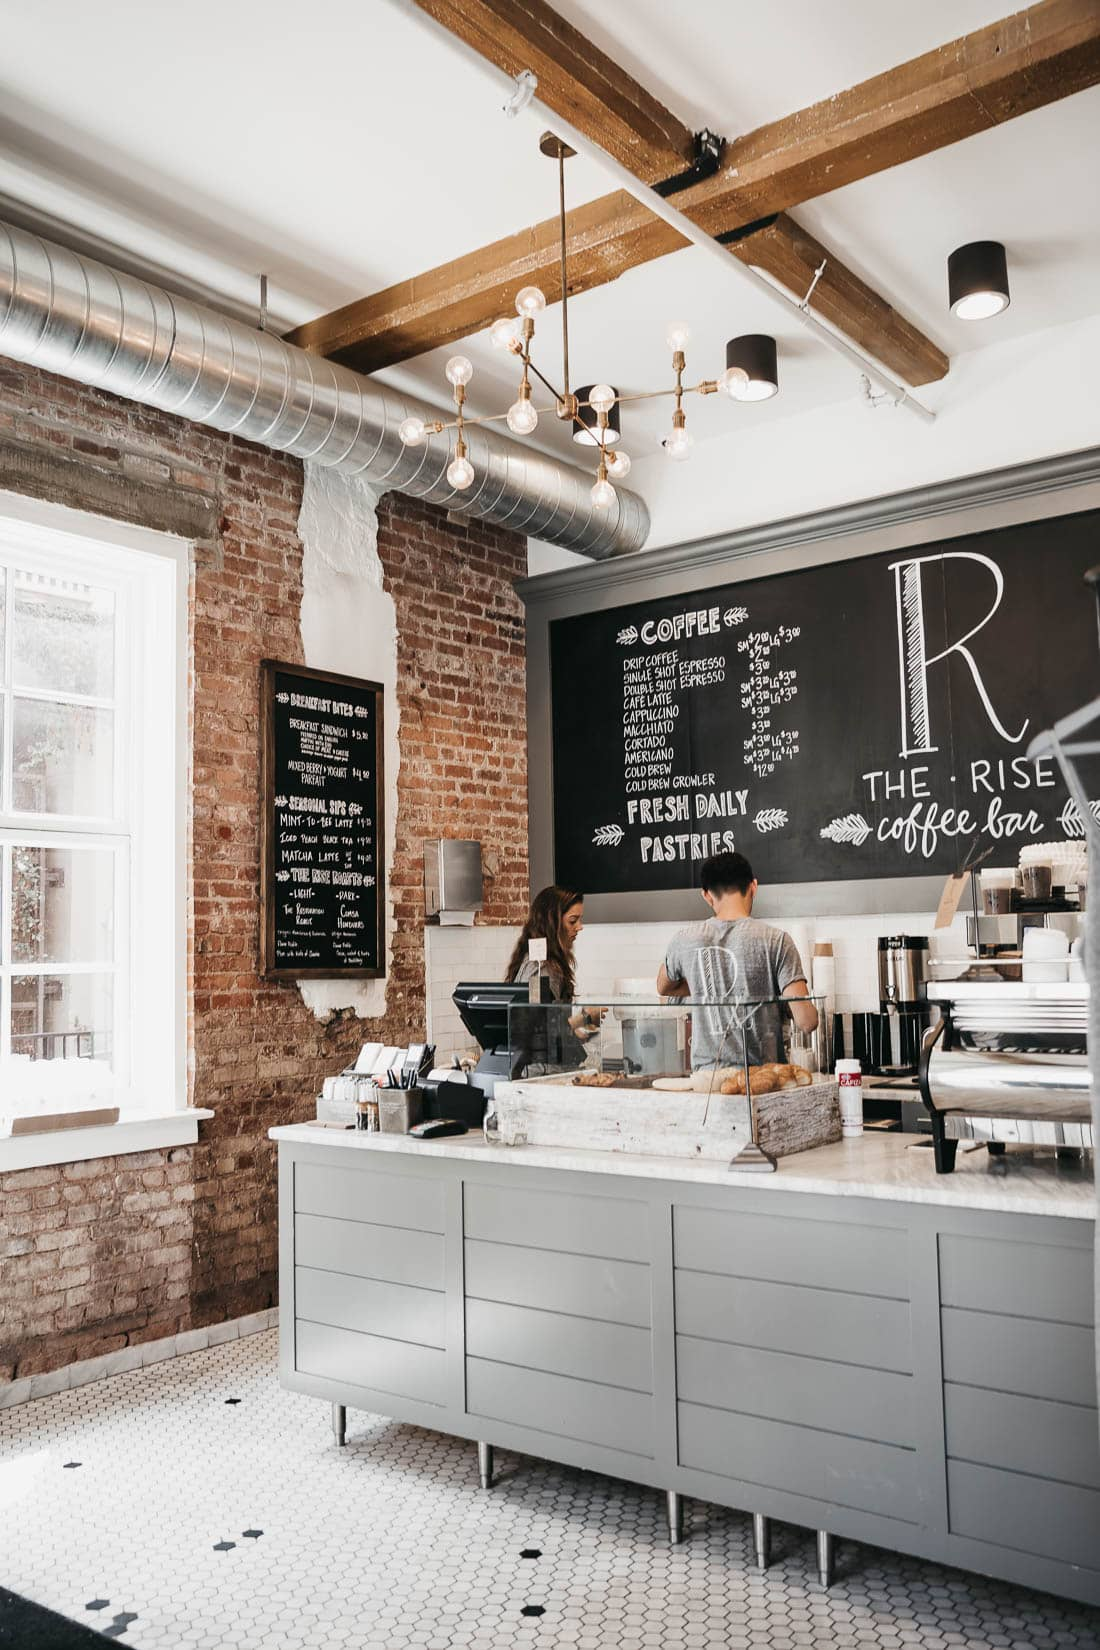 The Rise Coffee Bar